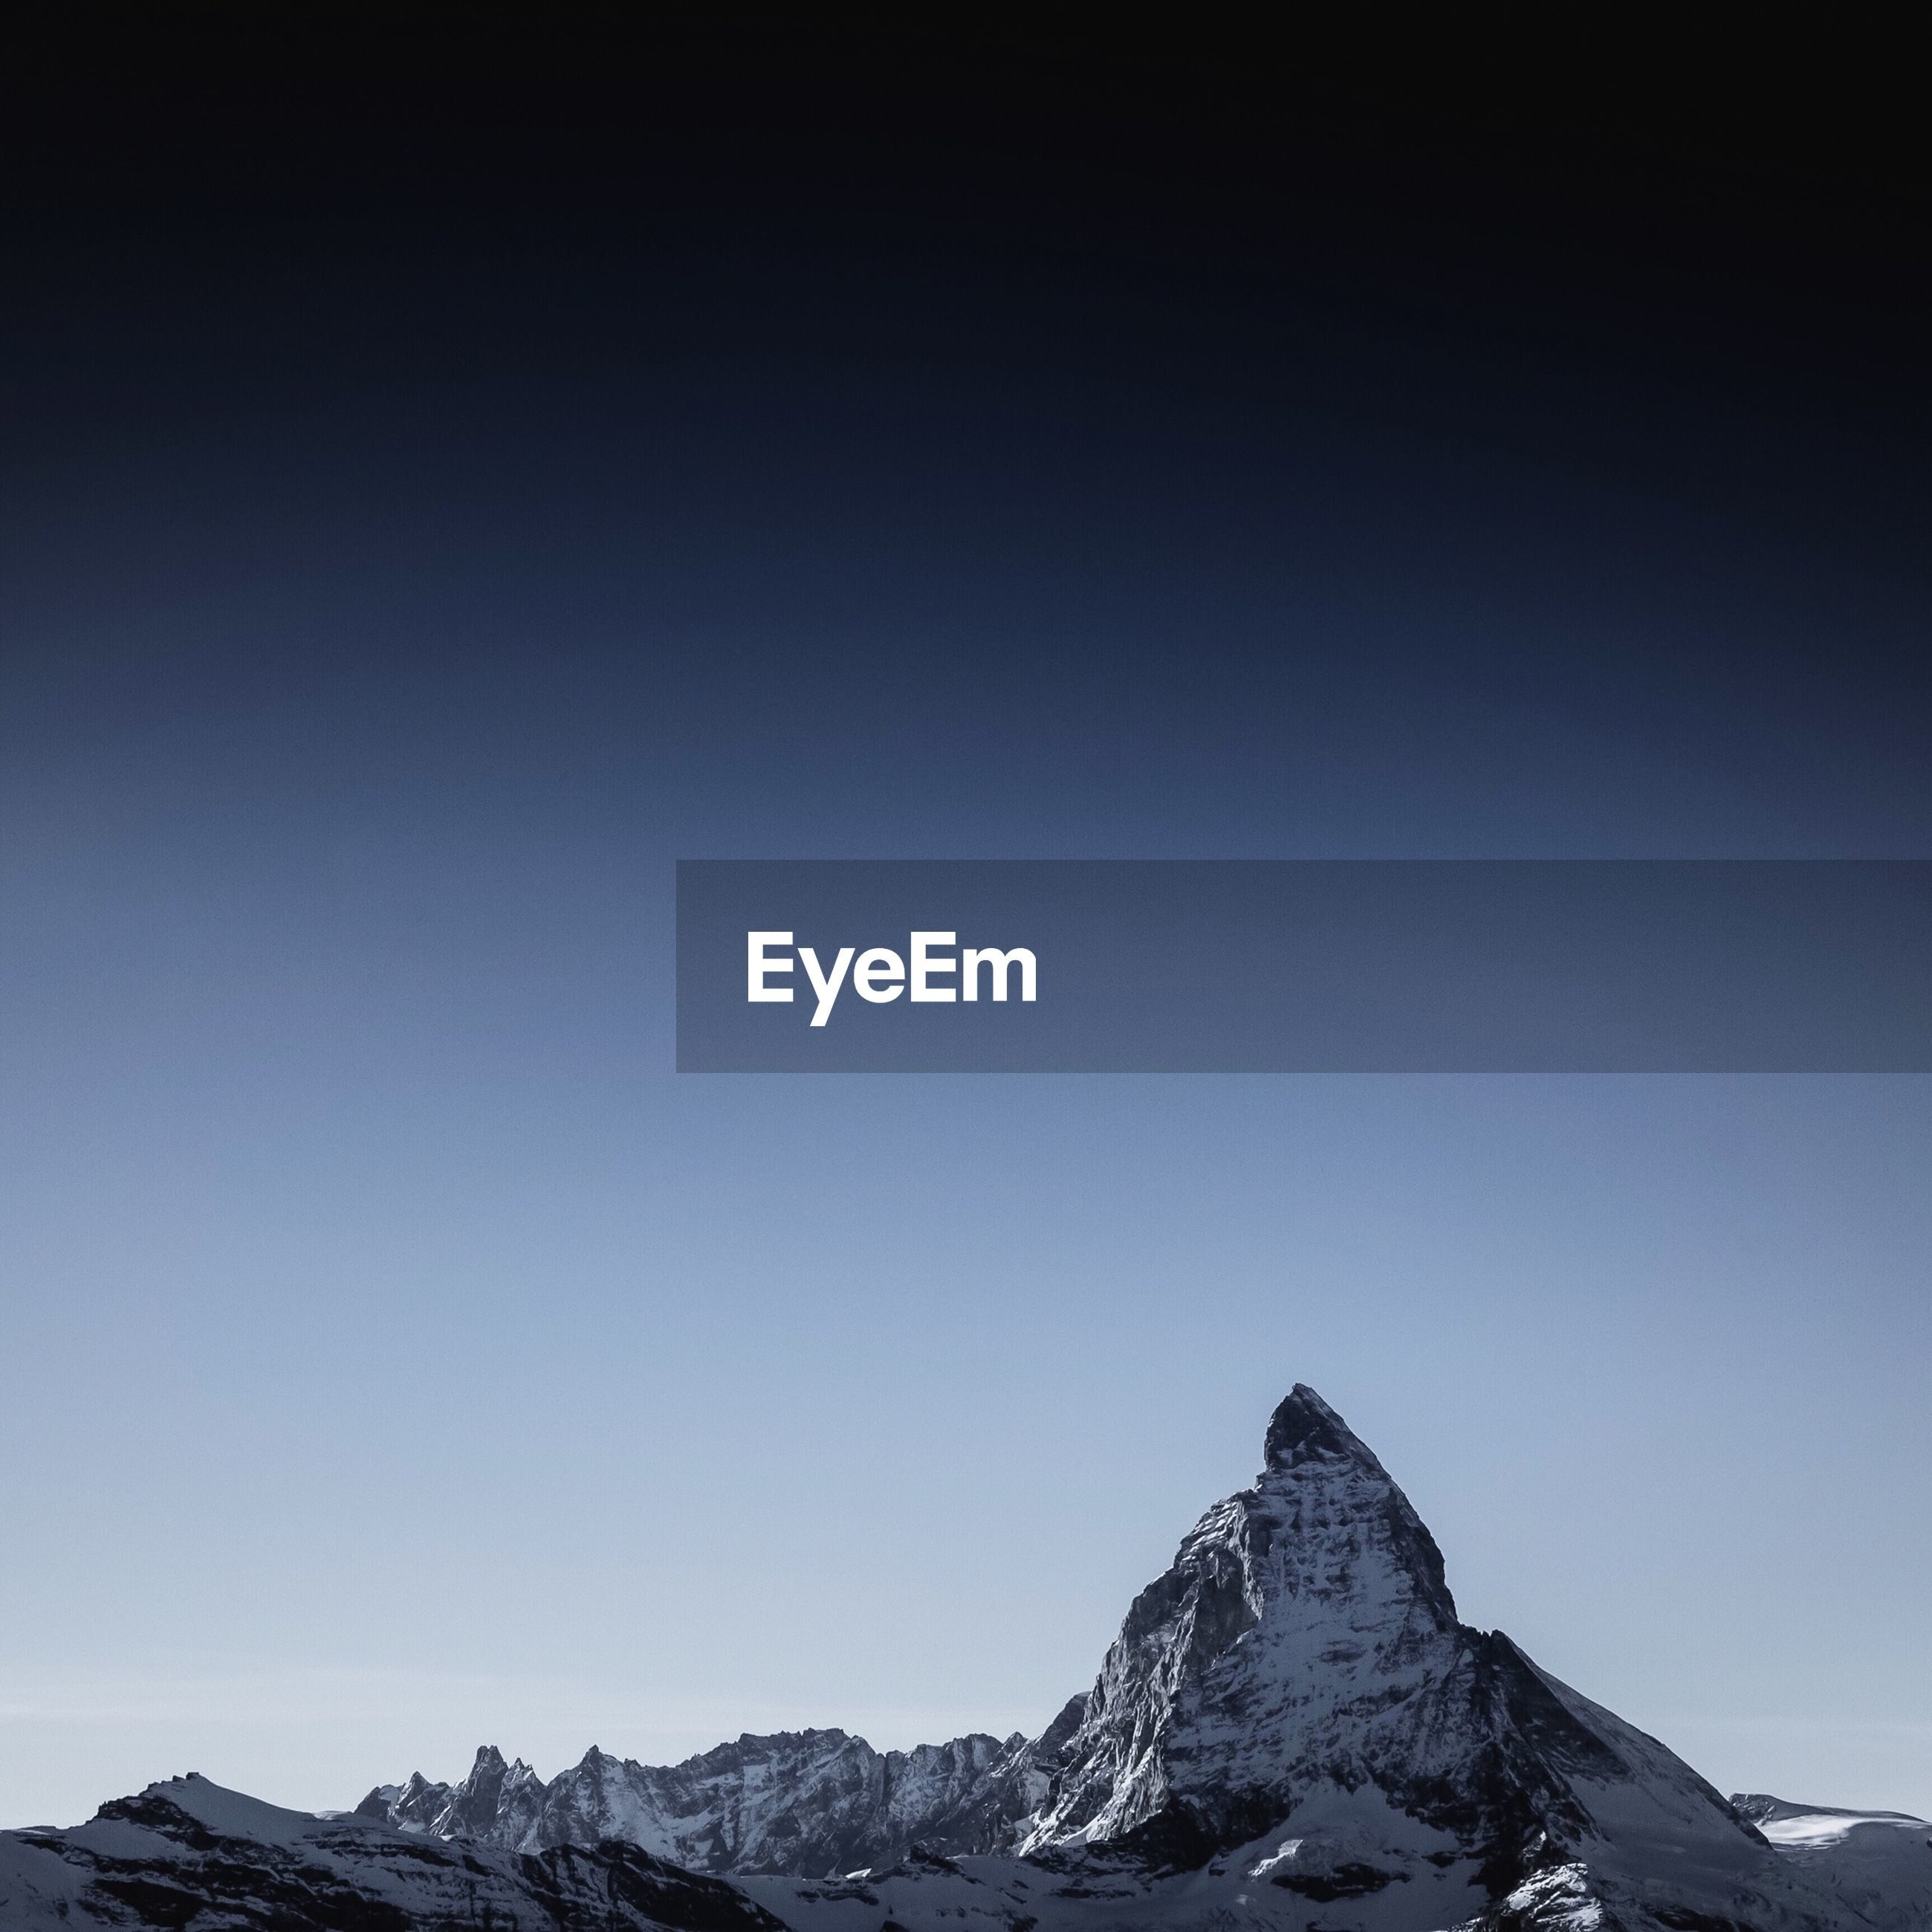 Snowcapped mountain against clear blue sky at dusk